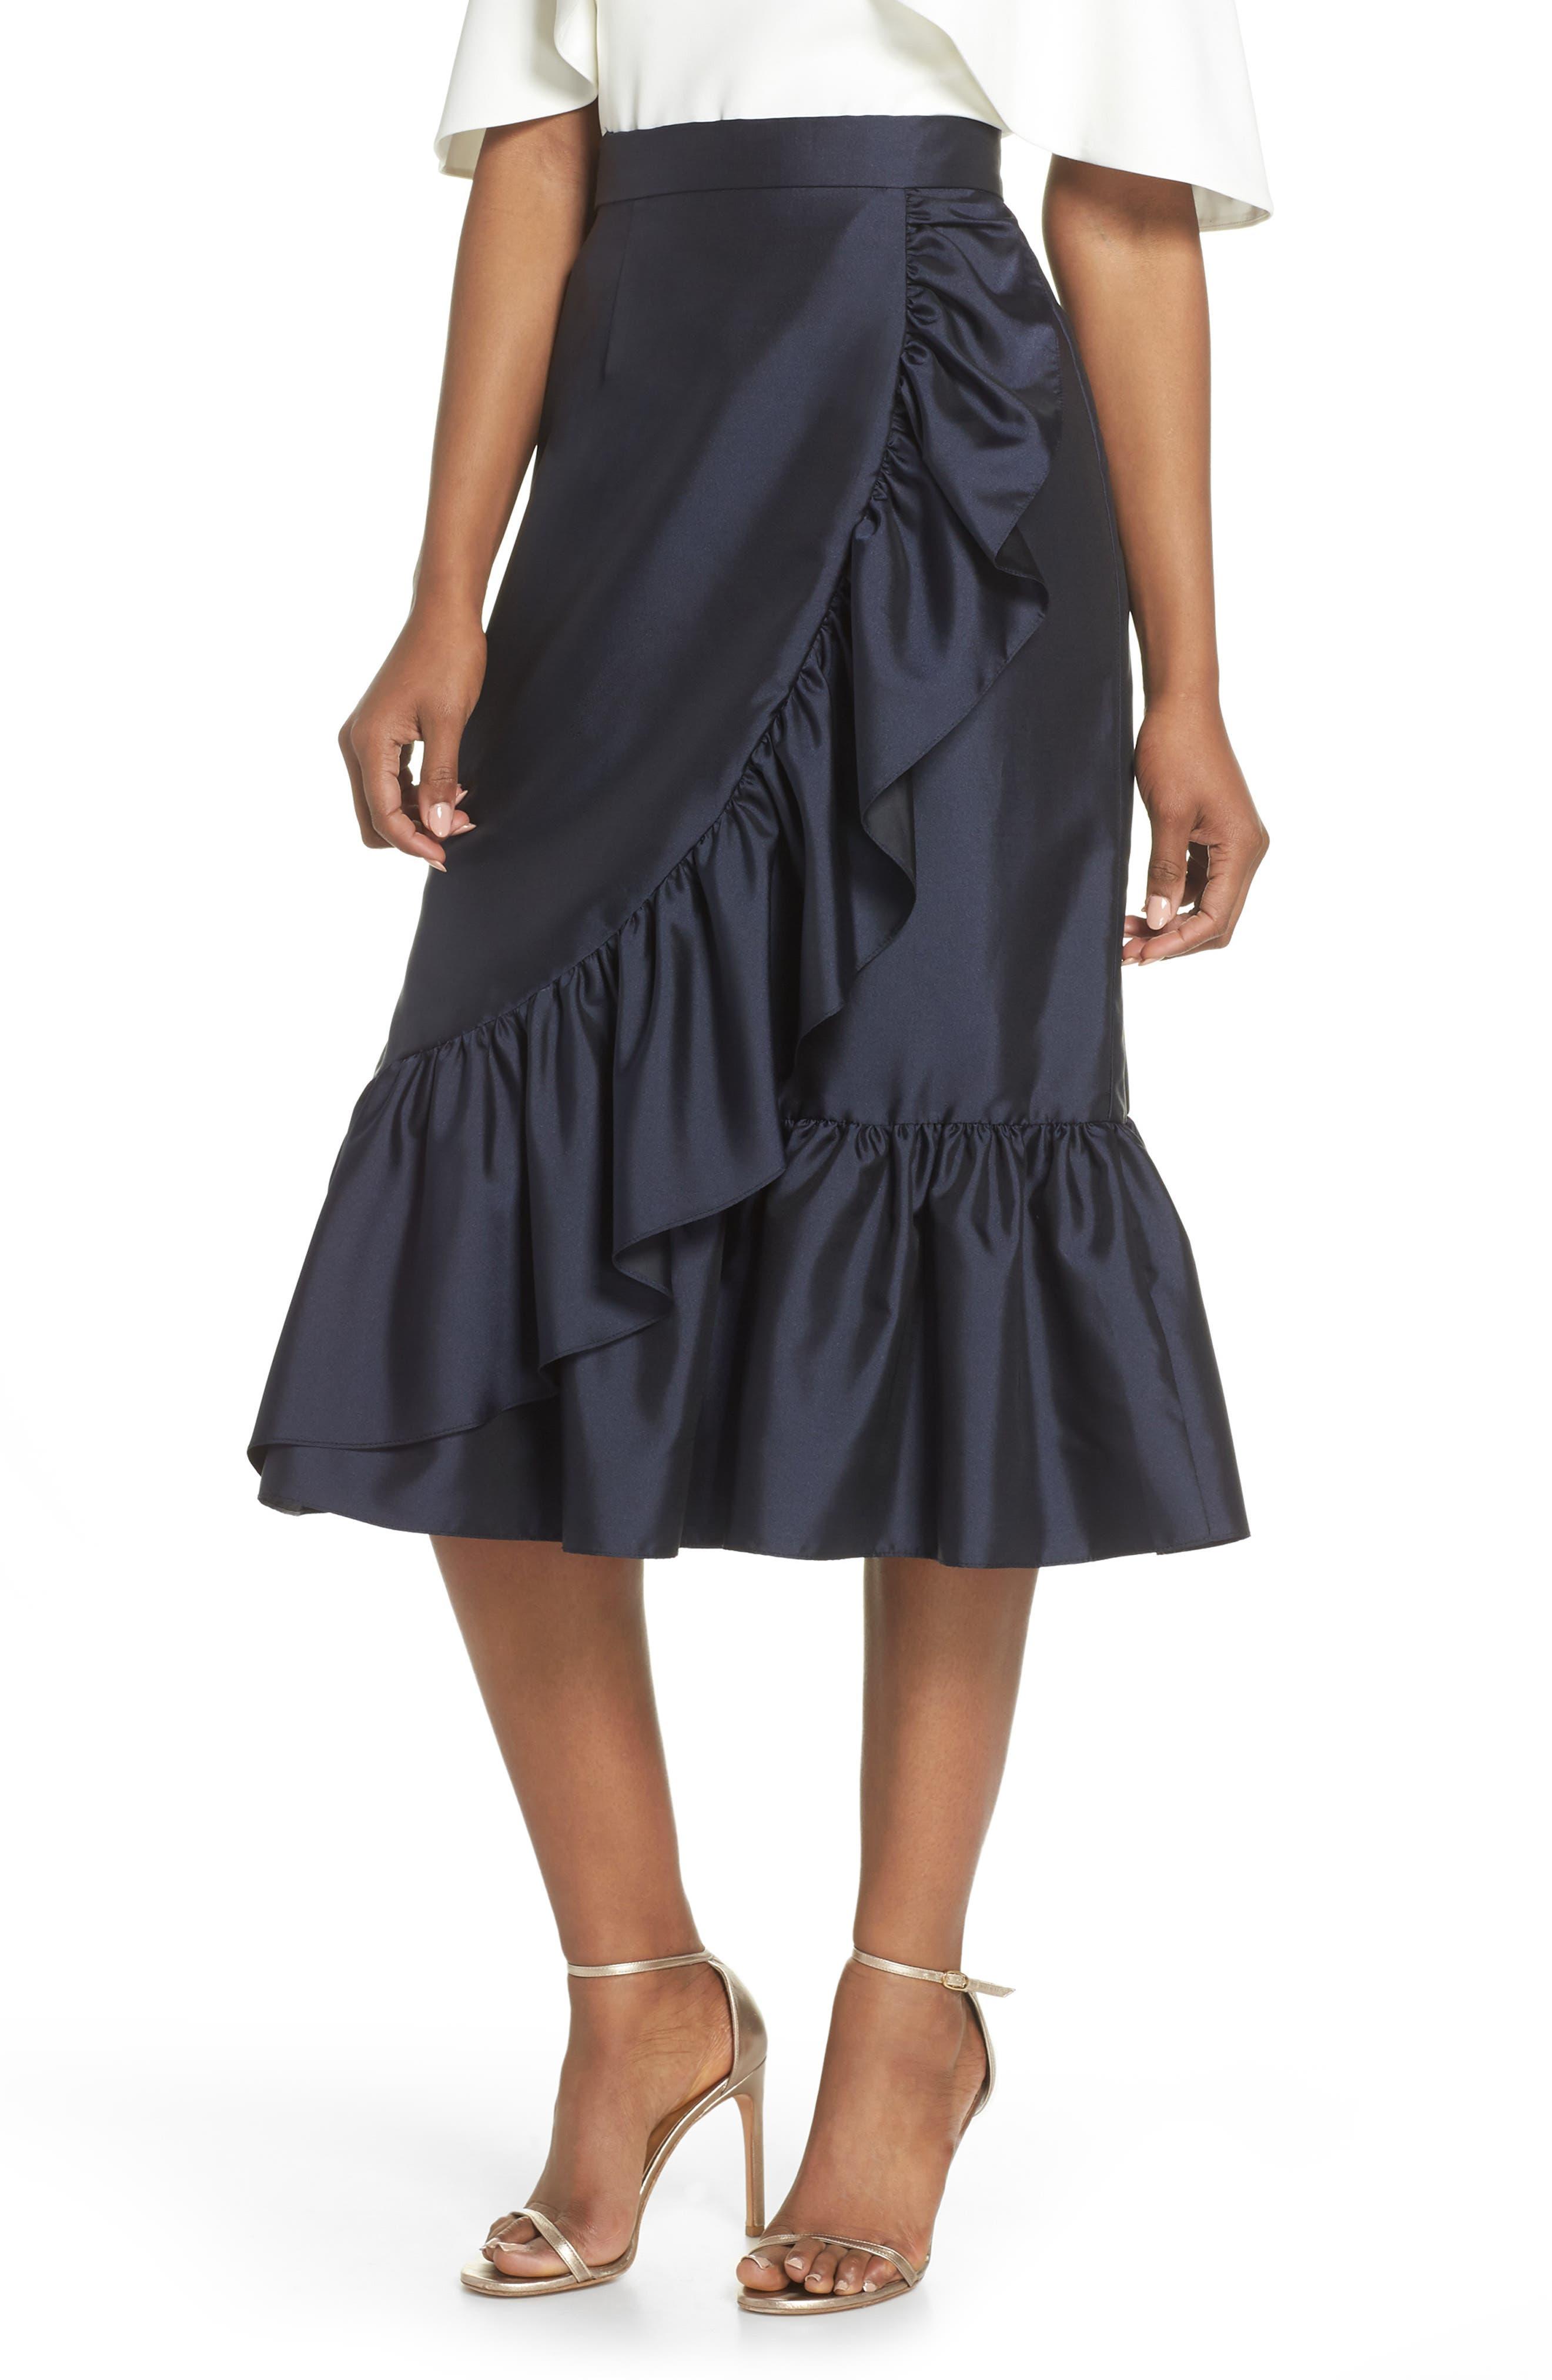 Taffeta Skirts